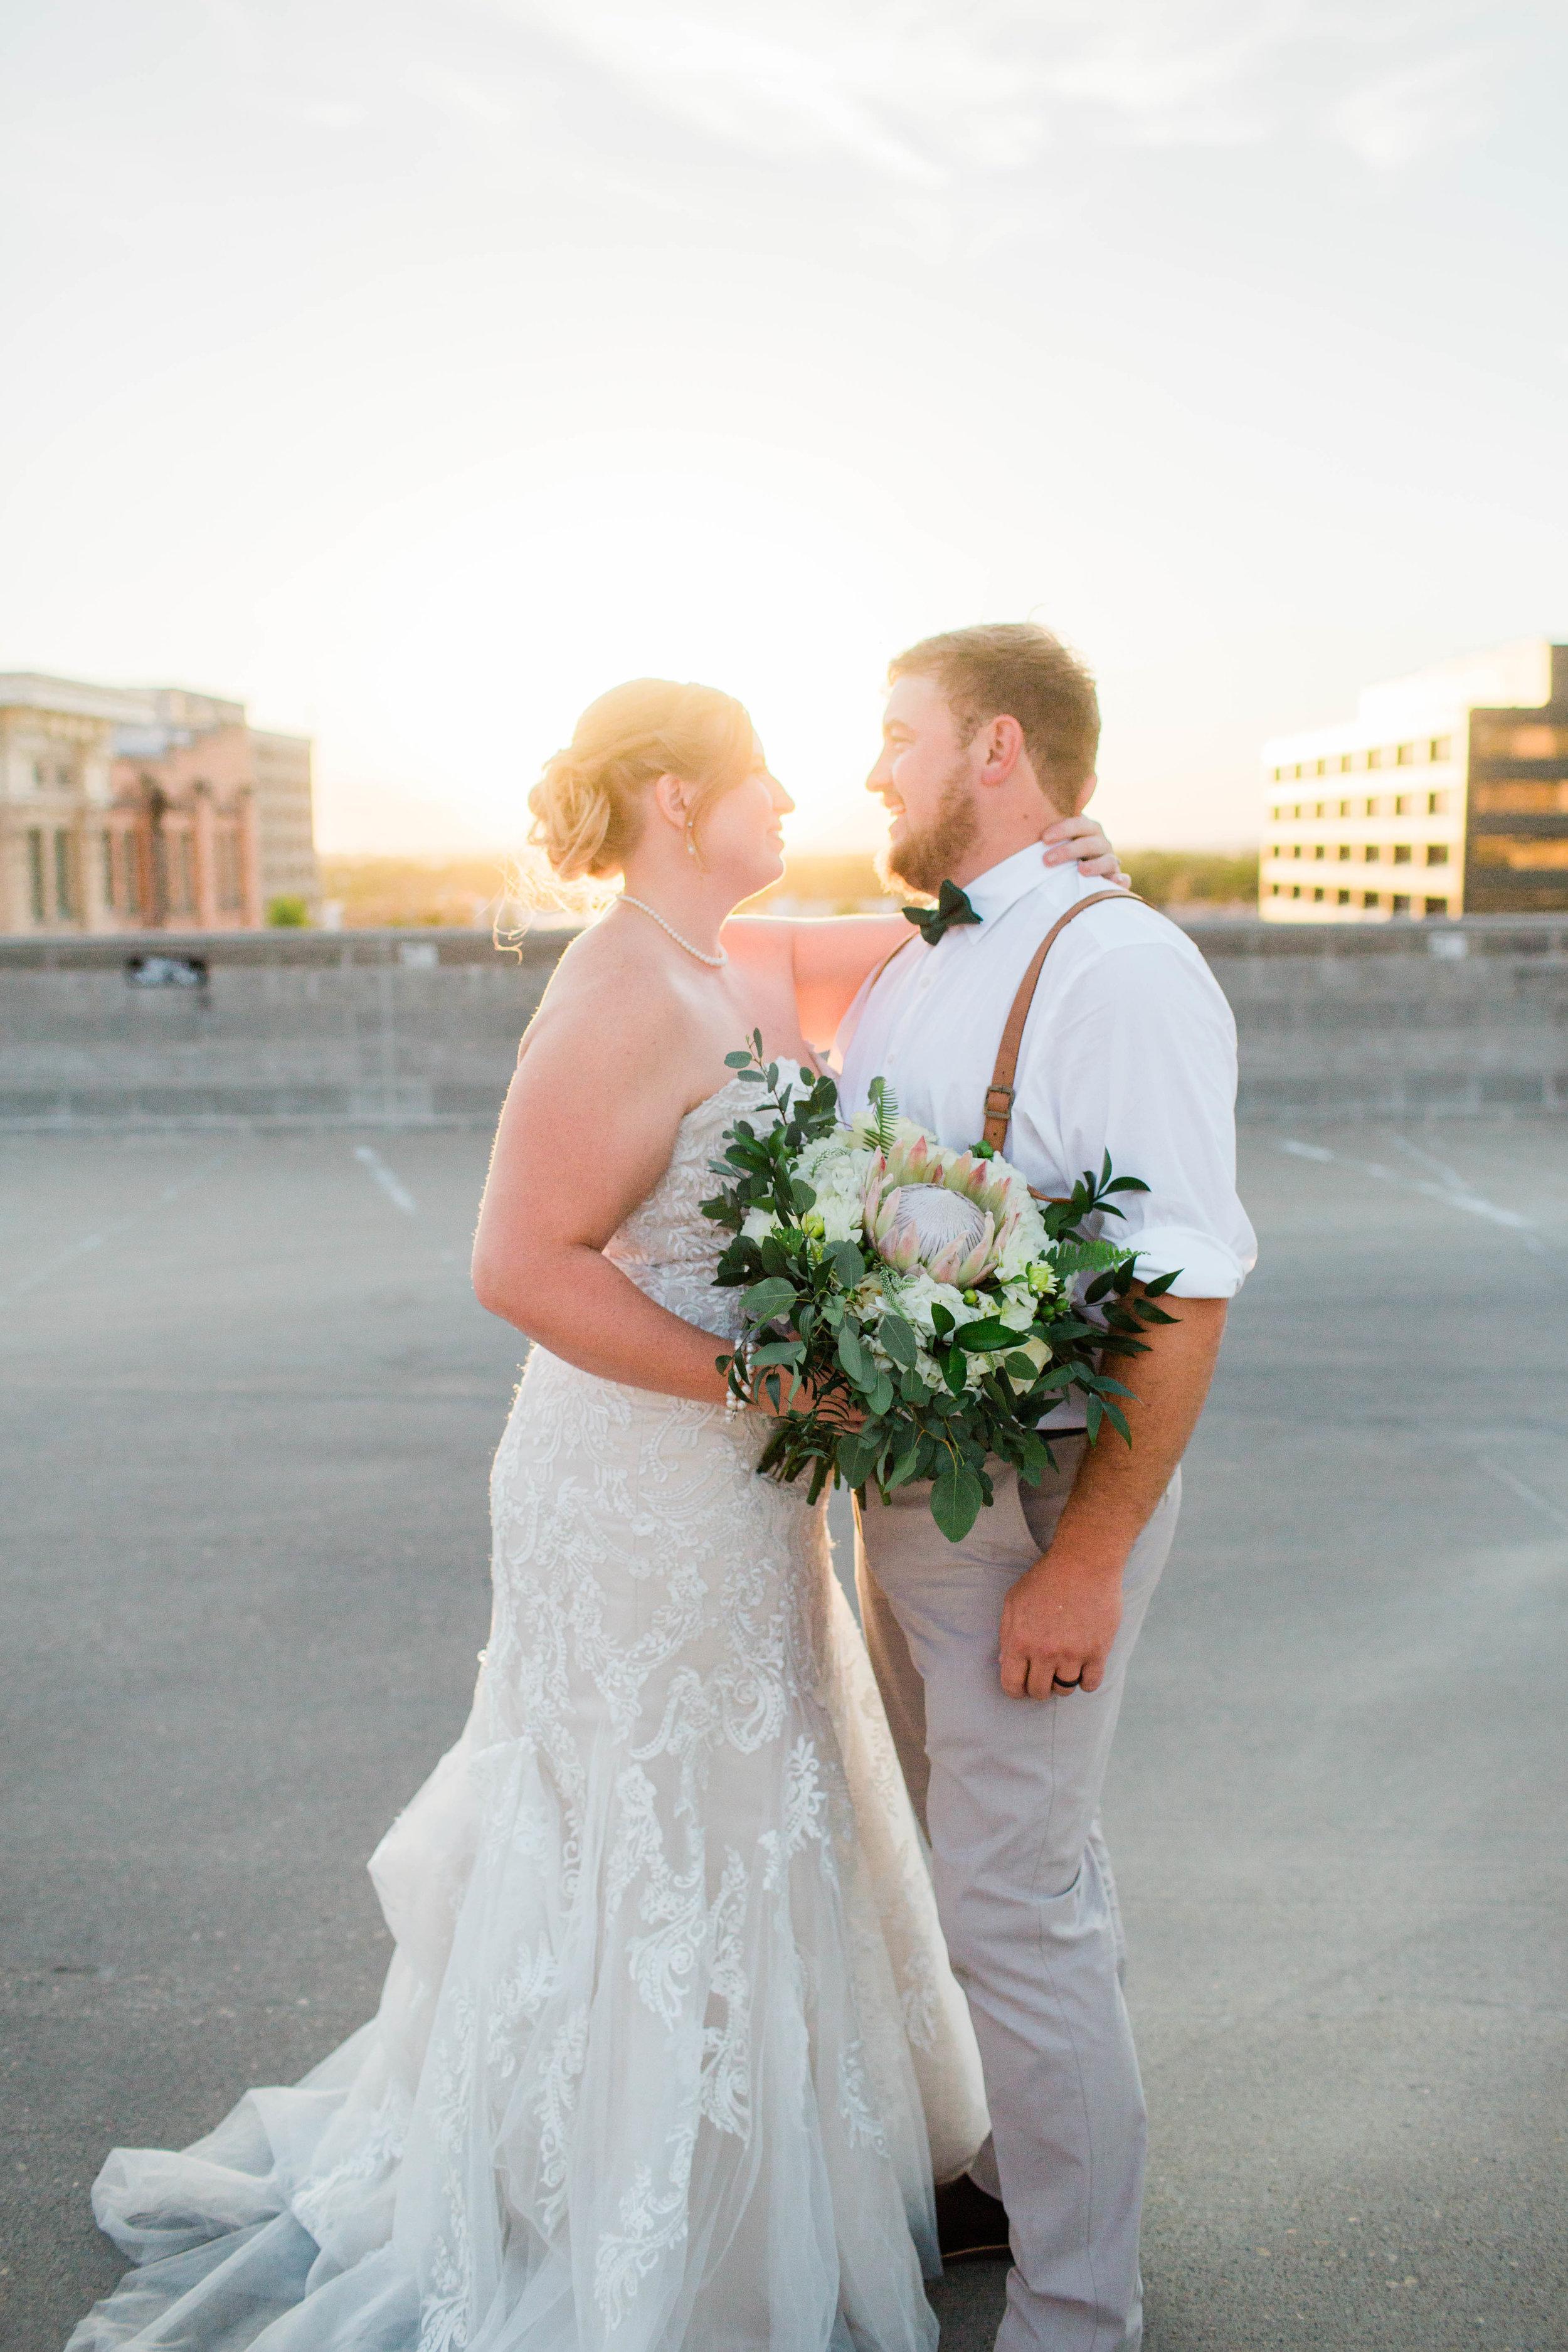 E-Lydia-Rohan-Downtown-Boise-Wedding-1.jpg